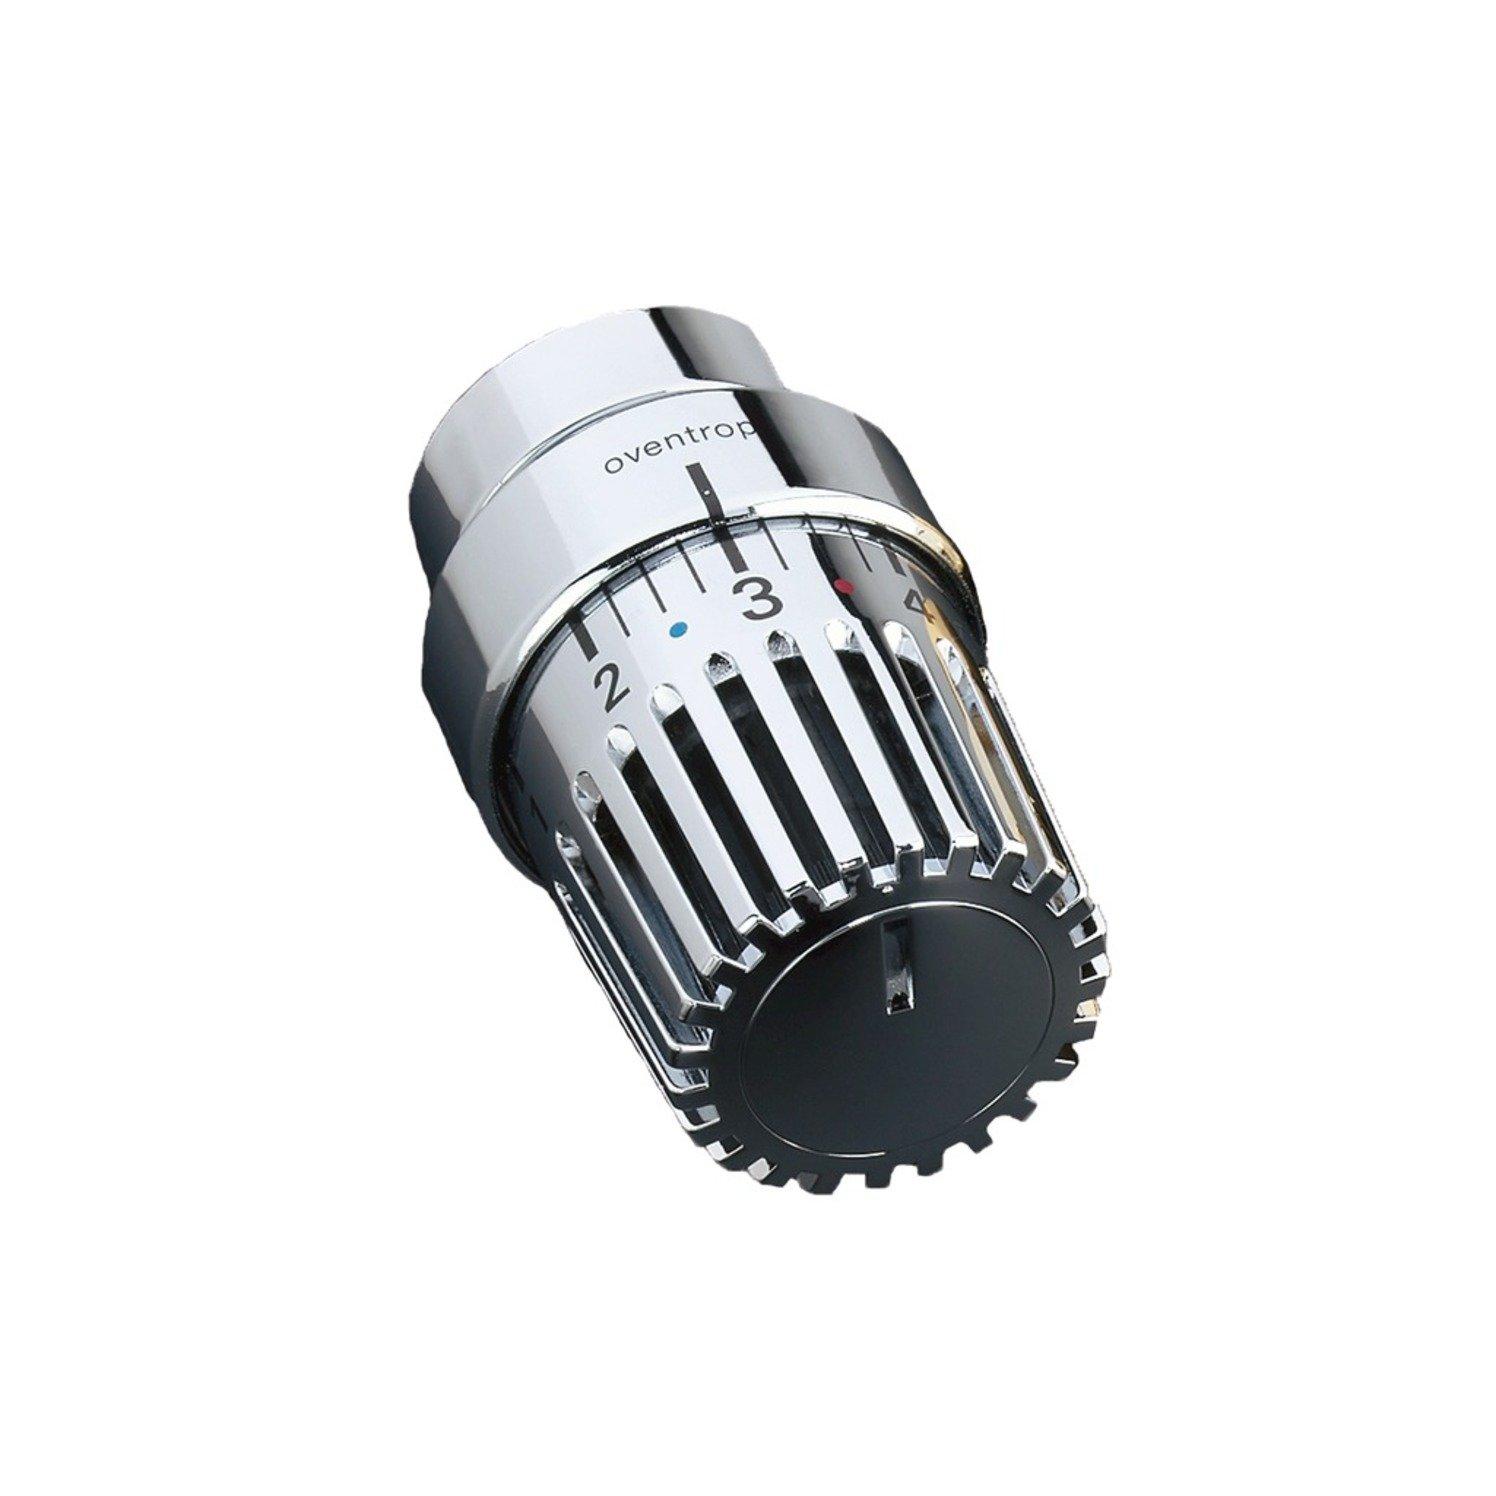 Oventrop Uni LH Thermostatventil M30x1,5 Paket: 10 St/ück 1011465